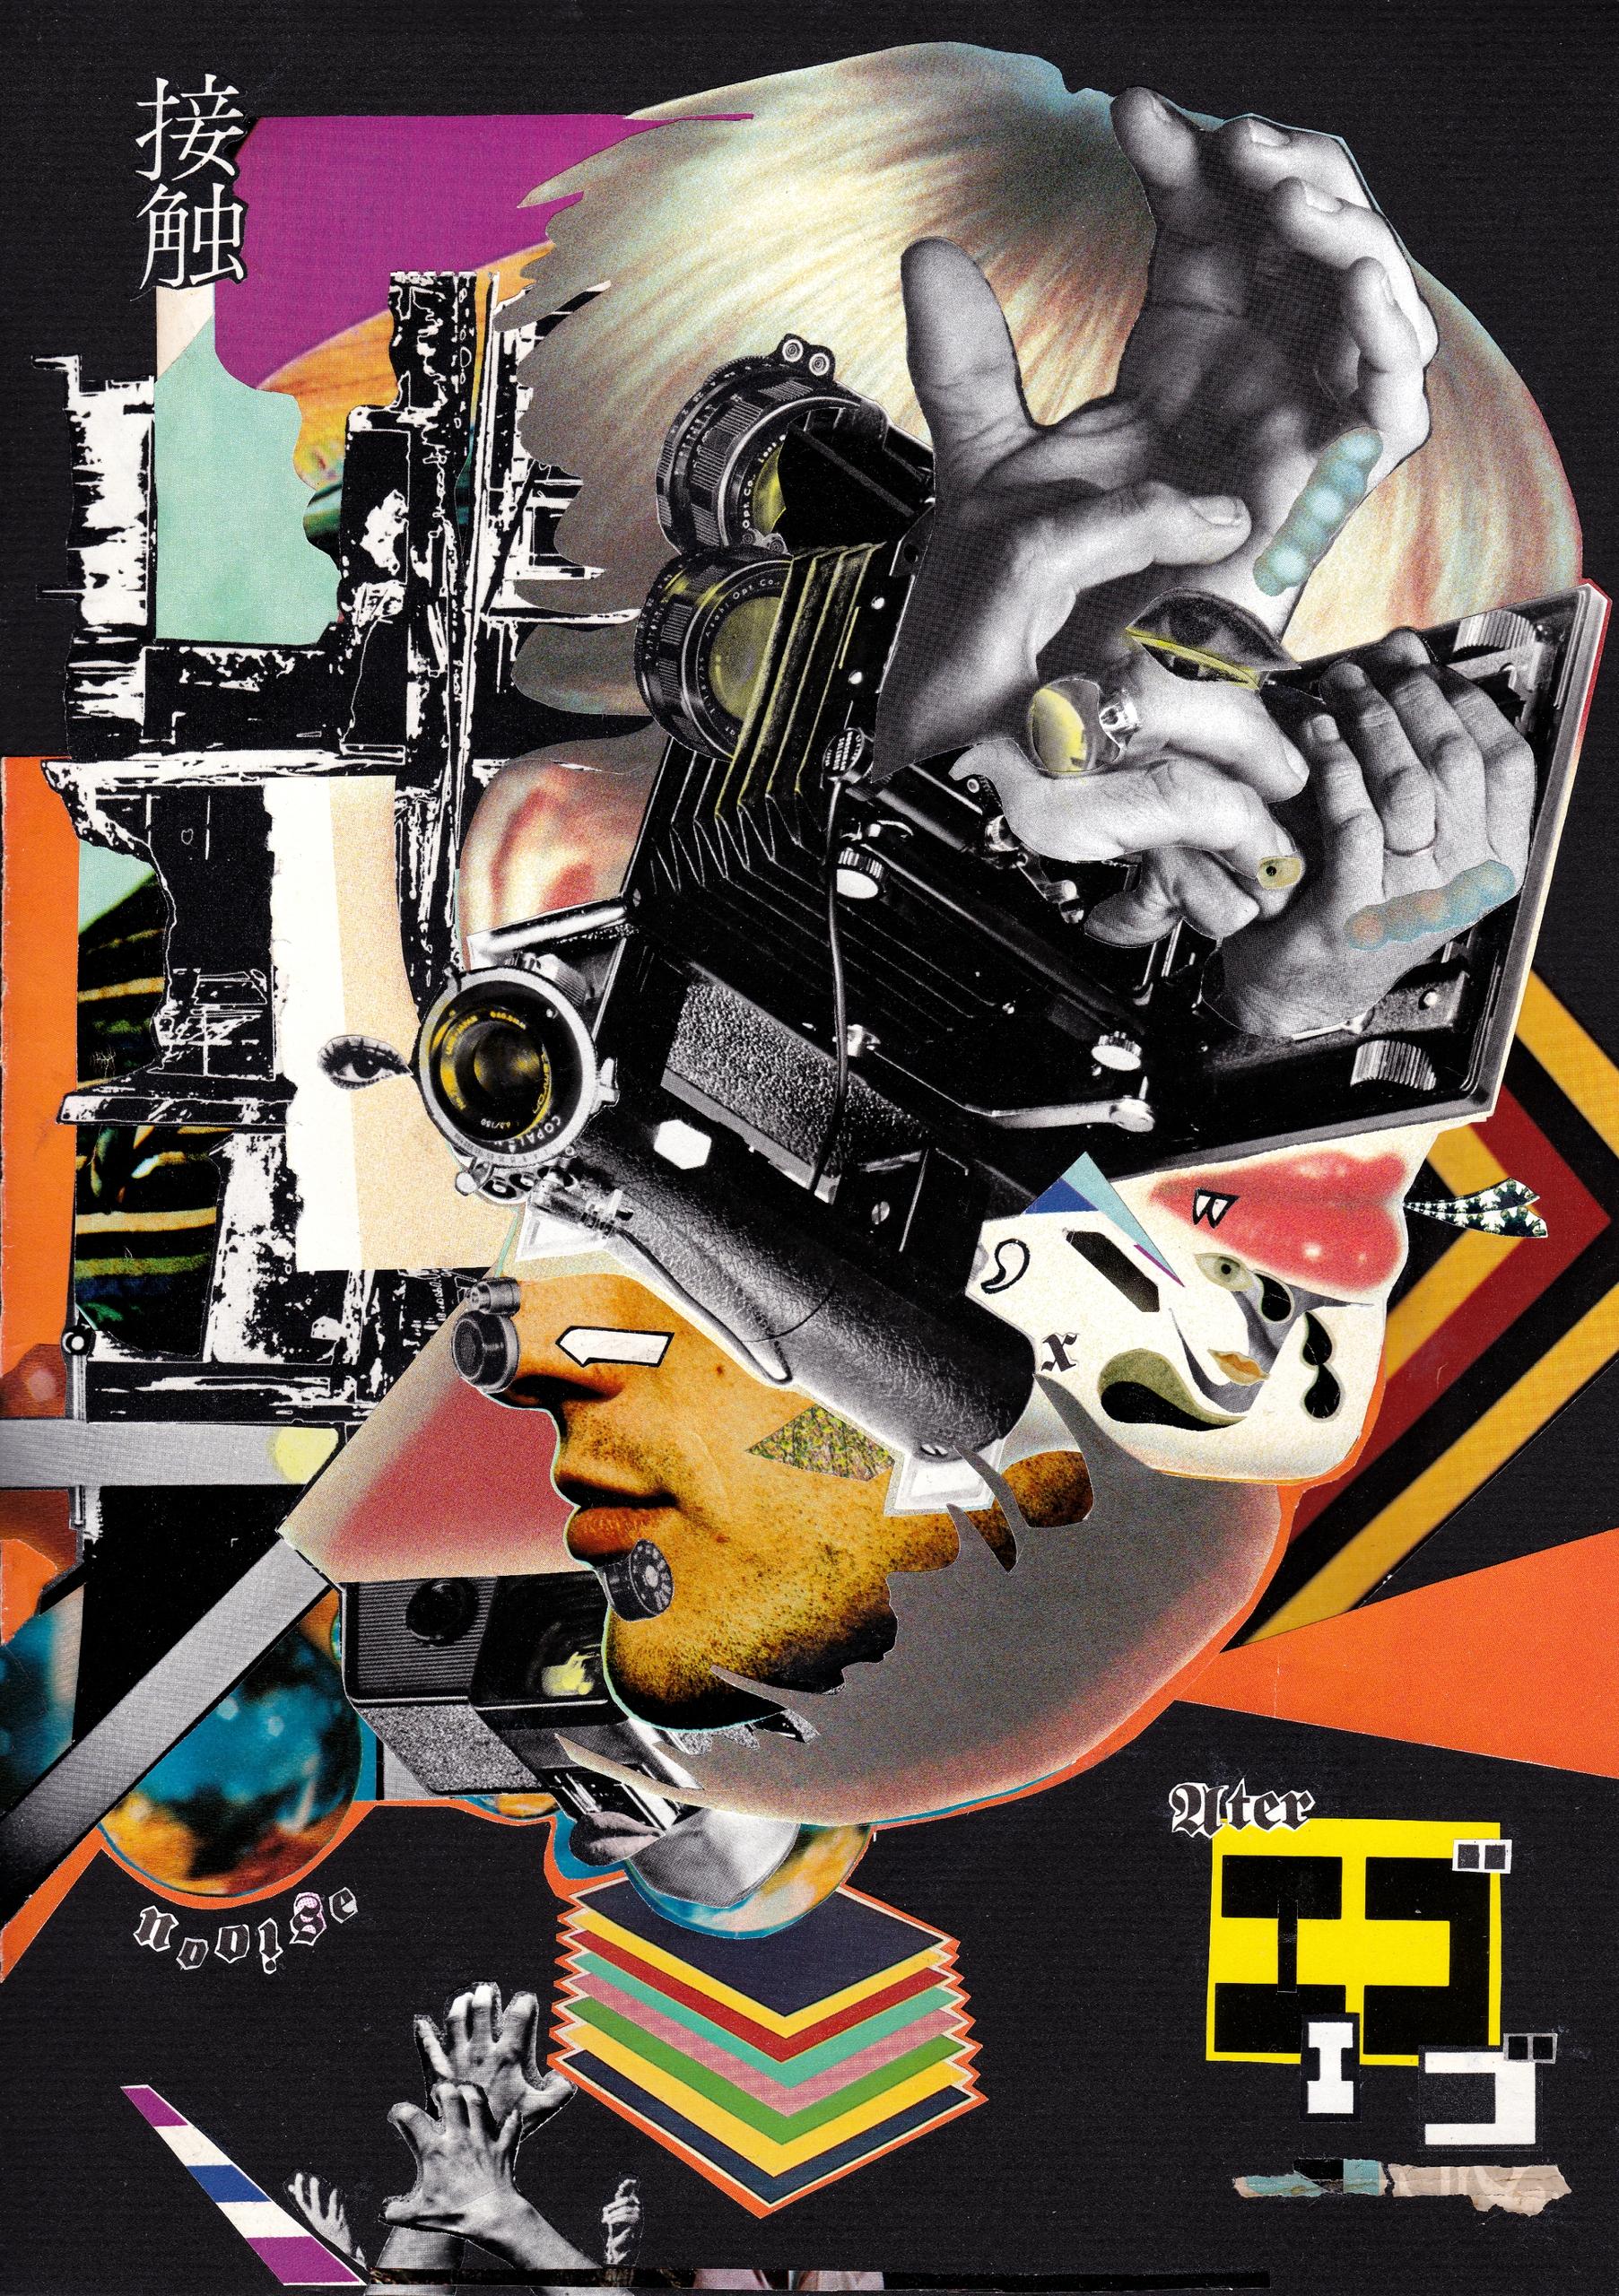 alter ego handmade collage - art - tsun-zaku | ello